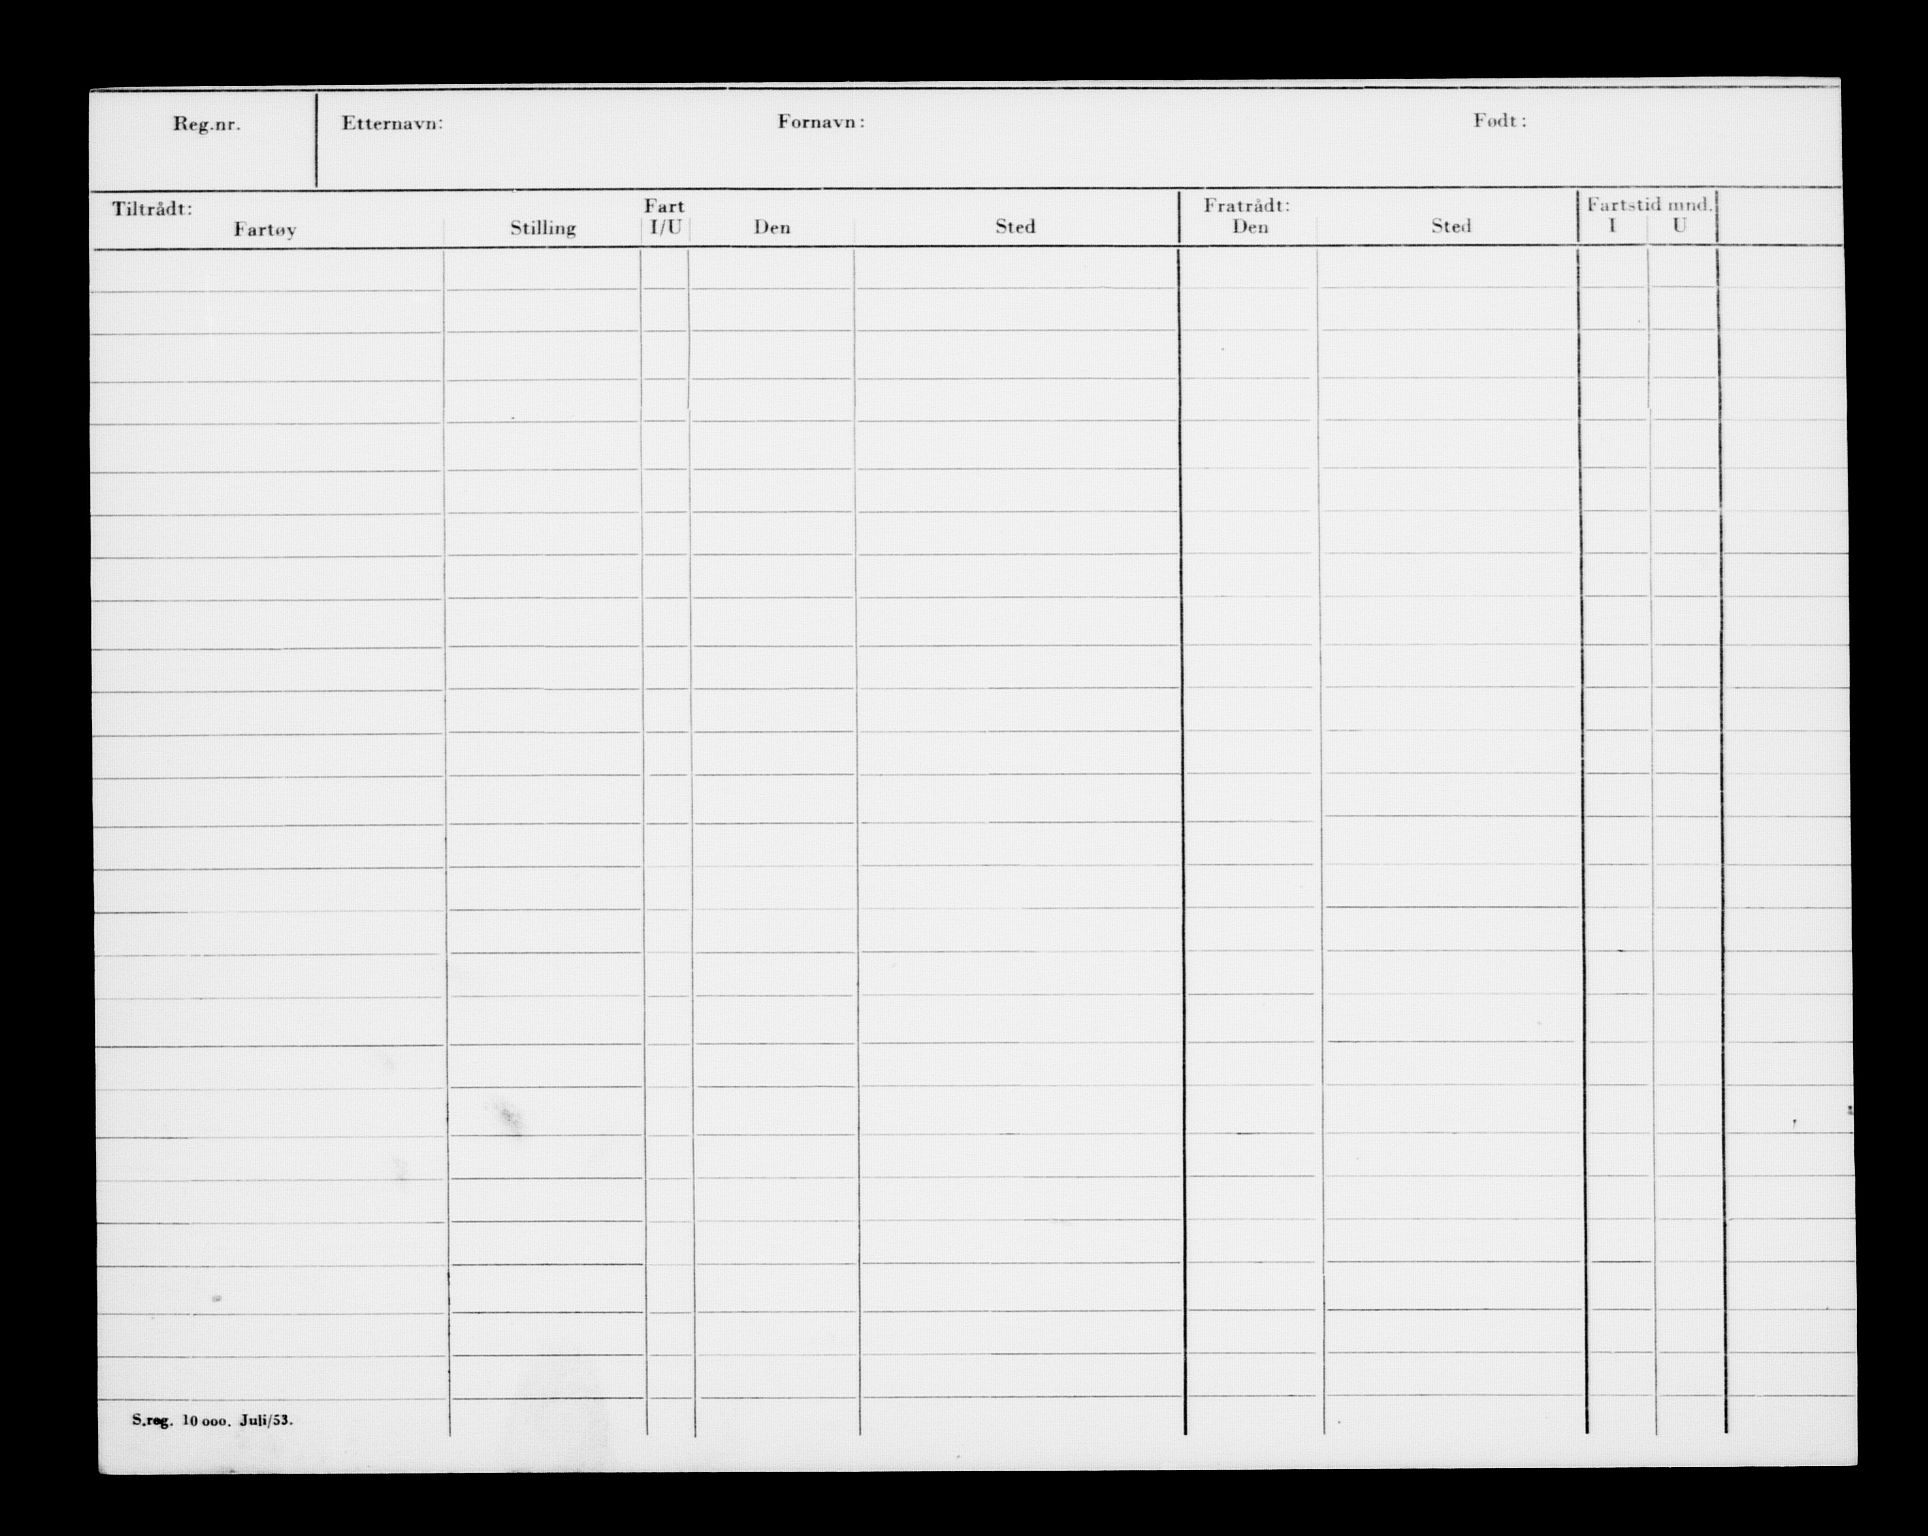 RA, Direktoratet for sjømenn, G/Gb/L0005: Hovedkort, 1888, s. 134